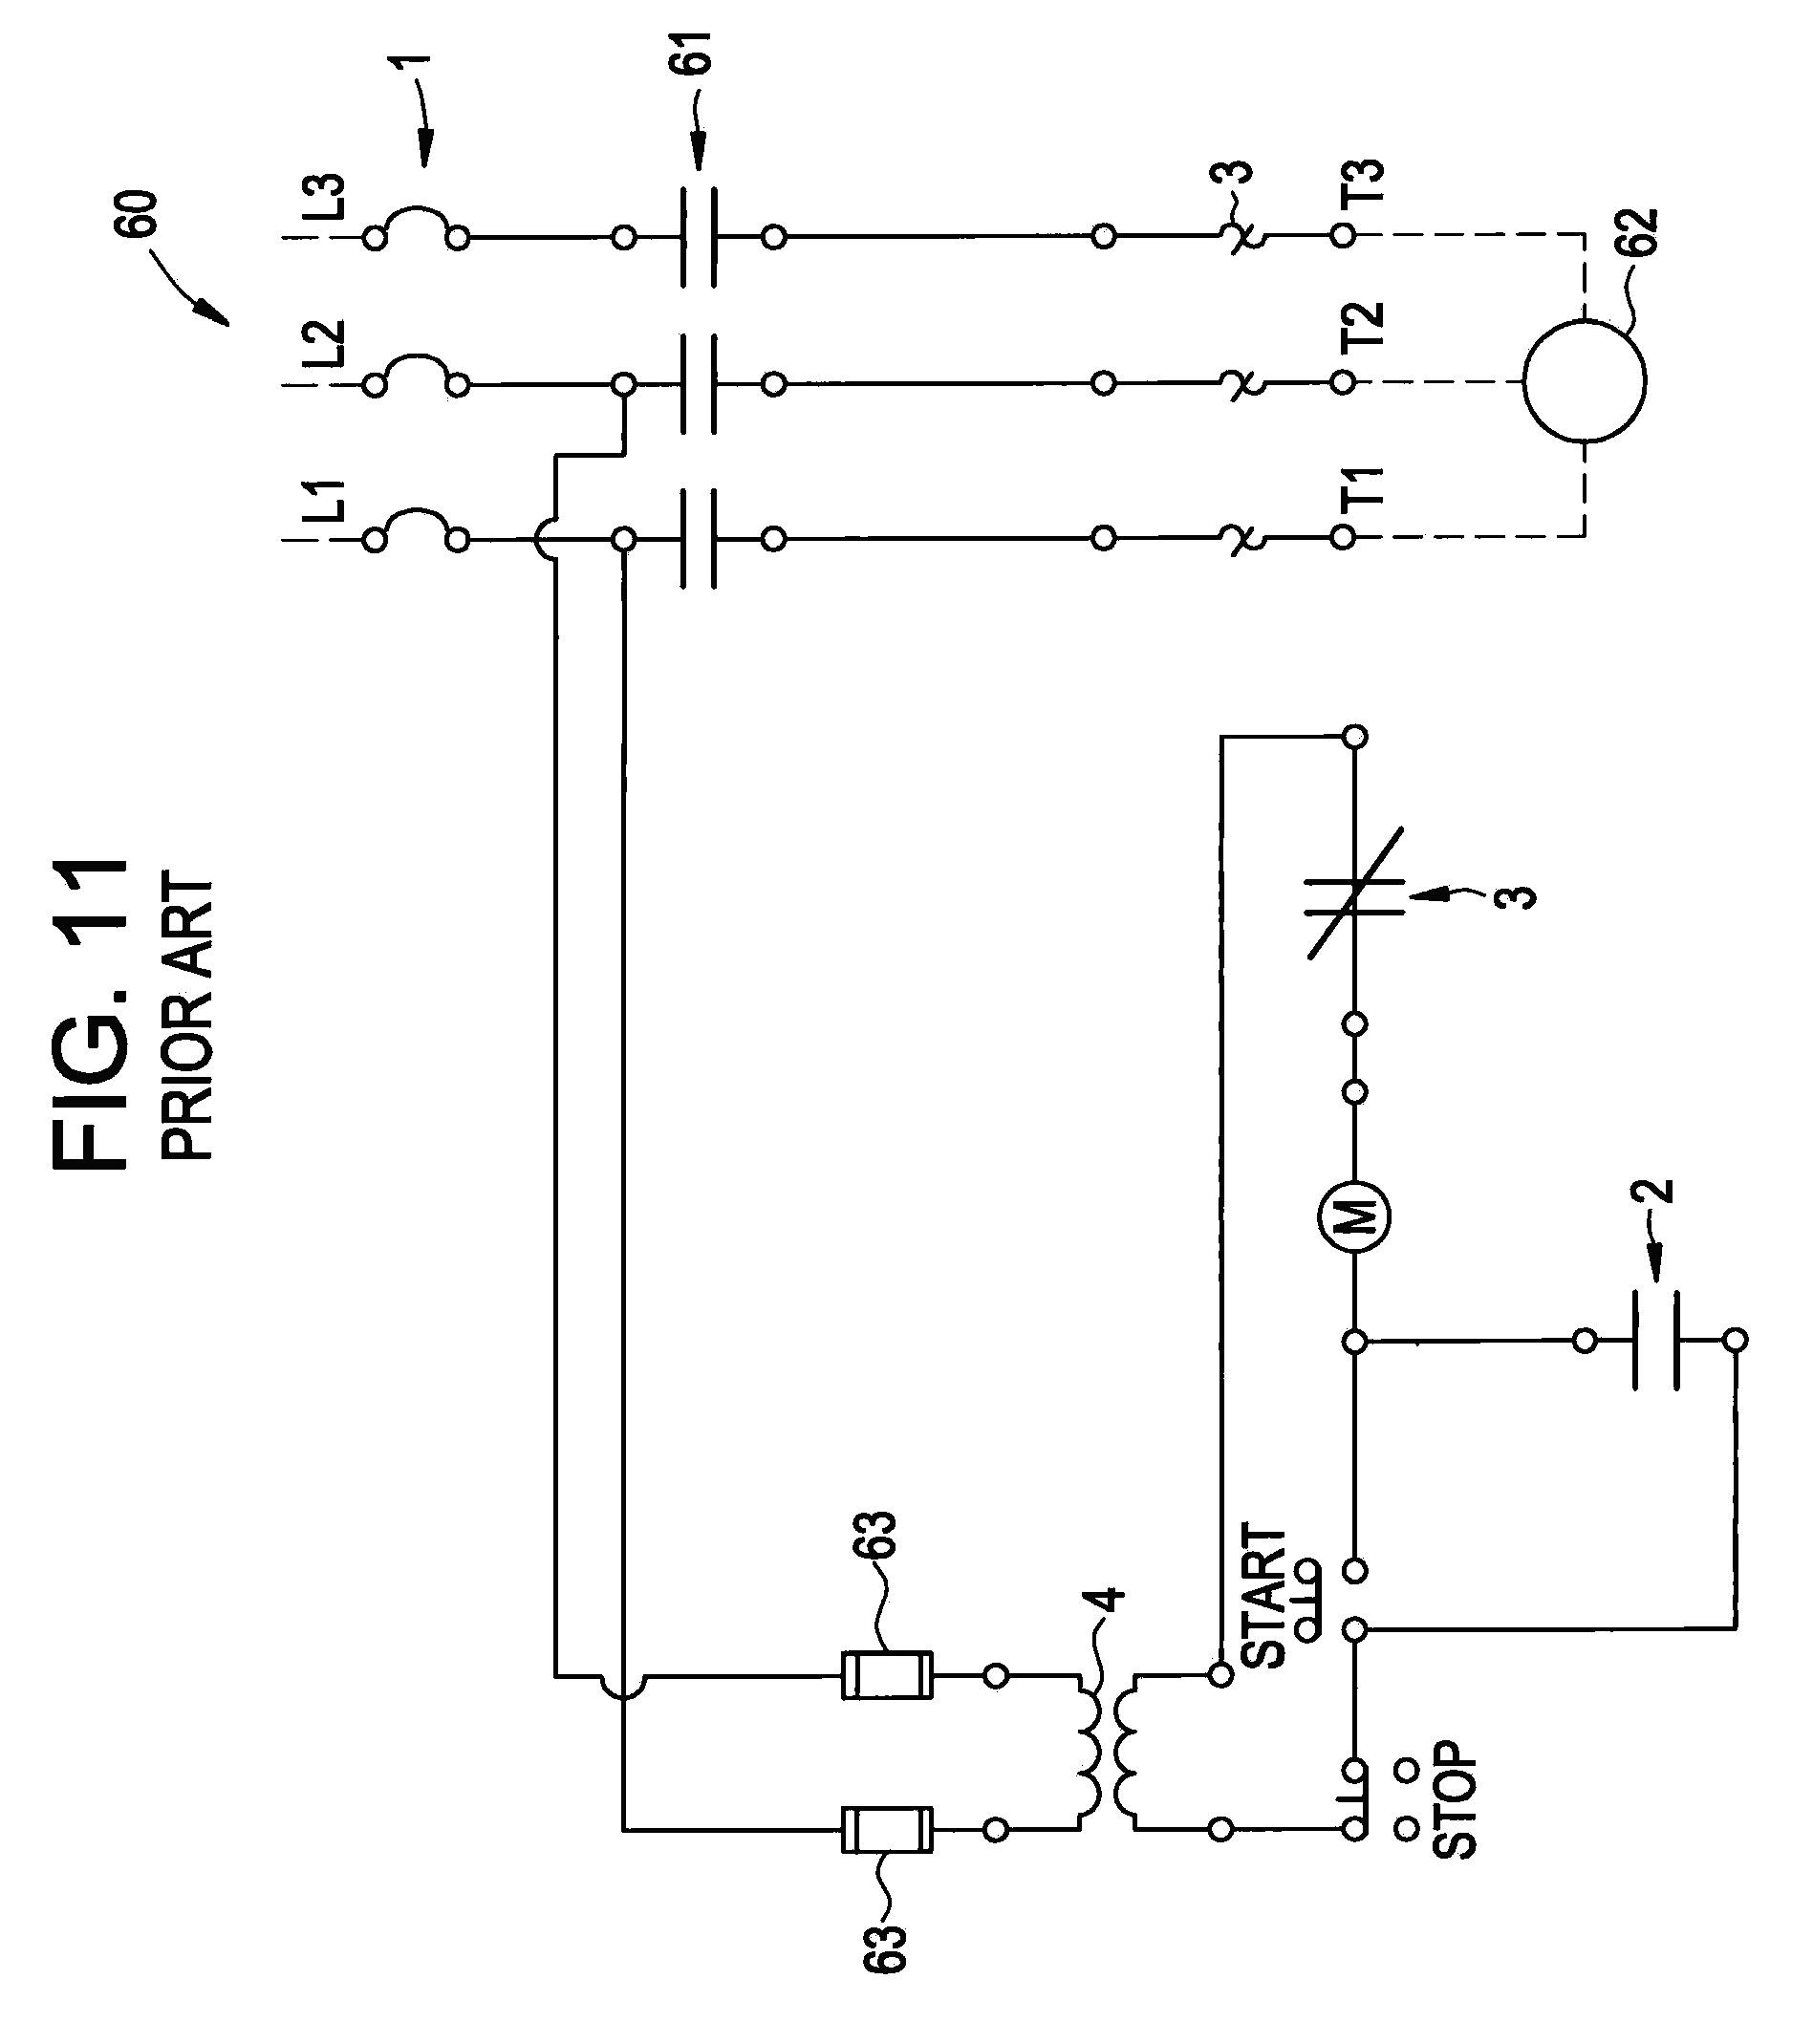 cutler hammer motor starter wiring diagram Collection-Wiring Diagram  Reversible Motor New Cutler Hammer Starter